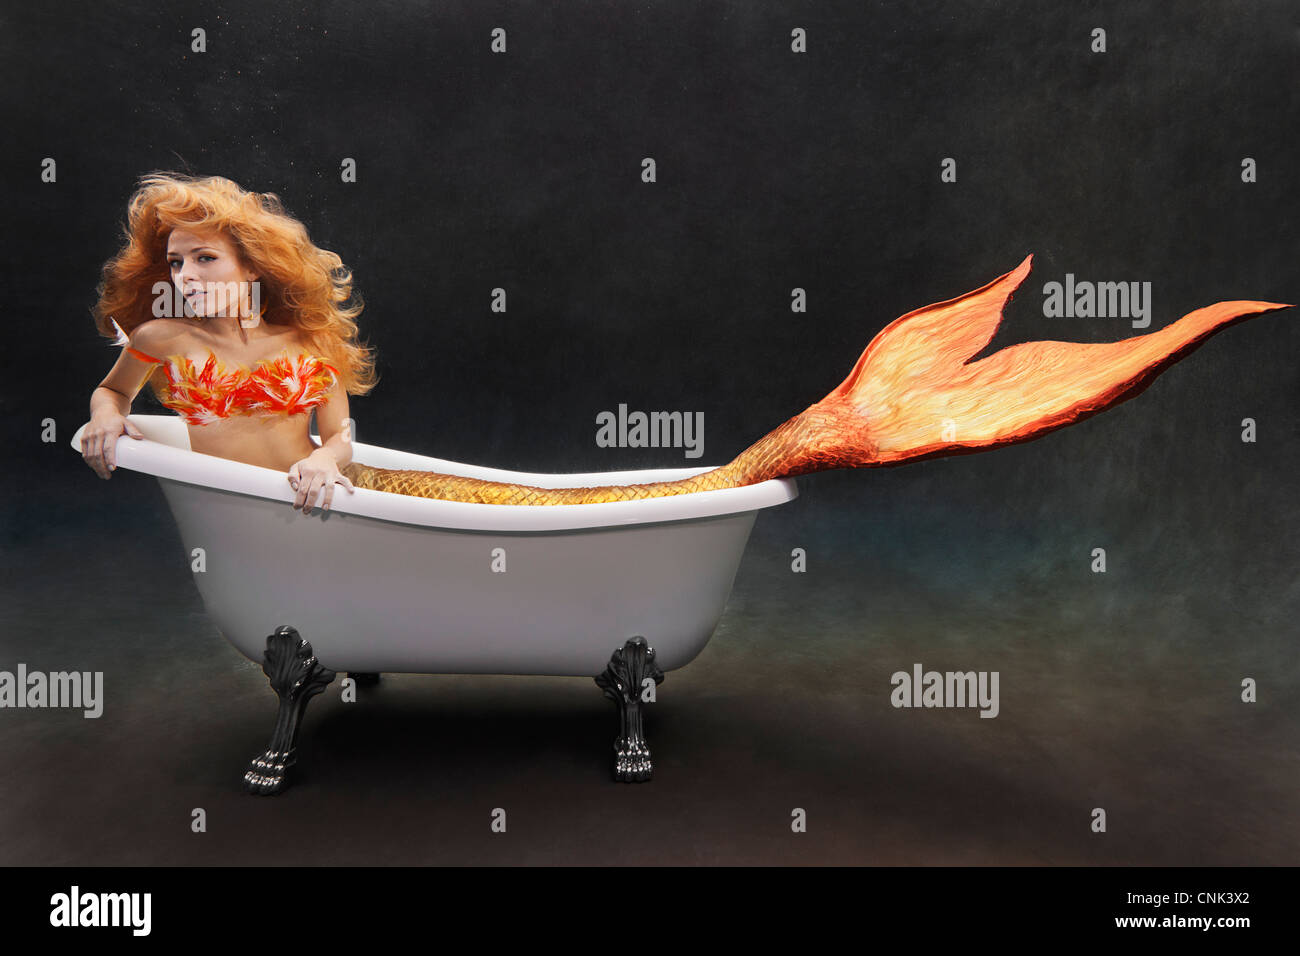 Young mermaid laying underwater in her Victoria + Albert bathtub - Stock Image